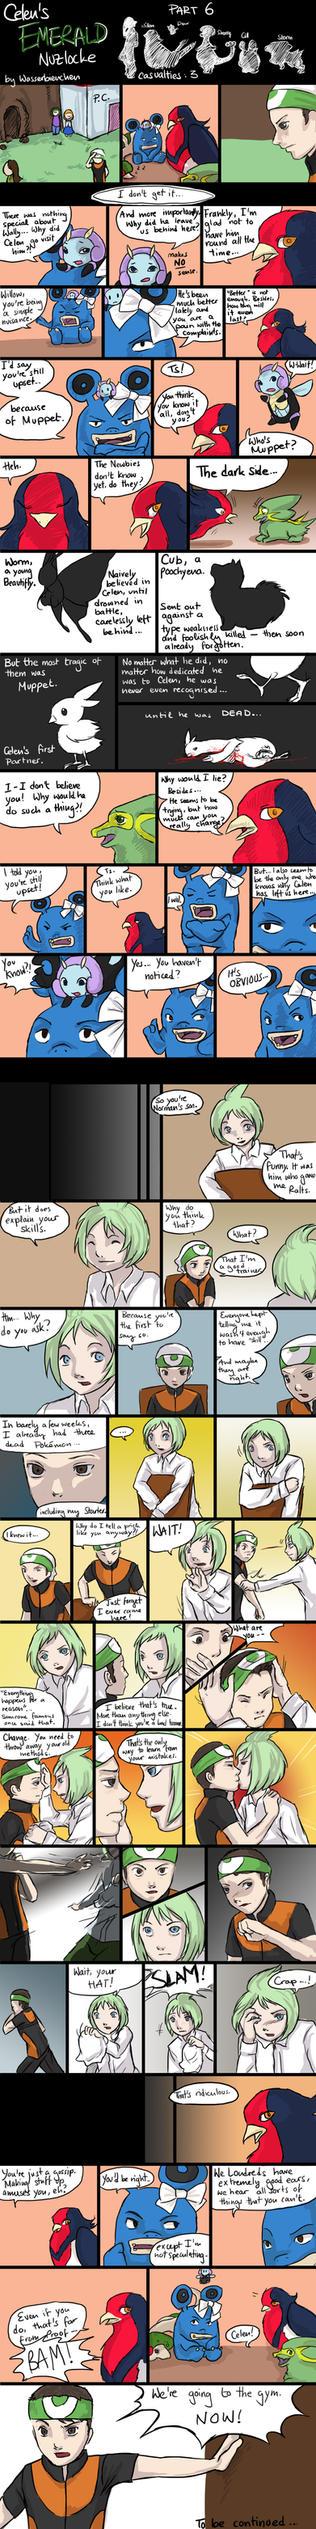 Celen's Nuzlocke: Part 6 by Wasserbienchen